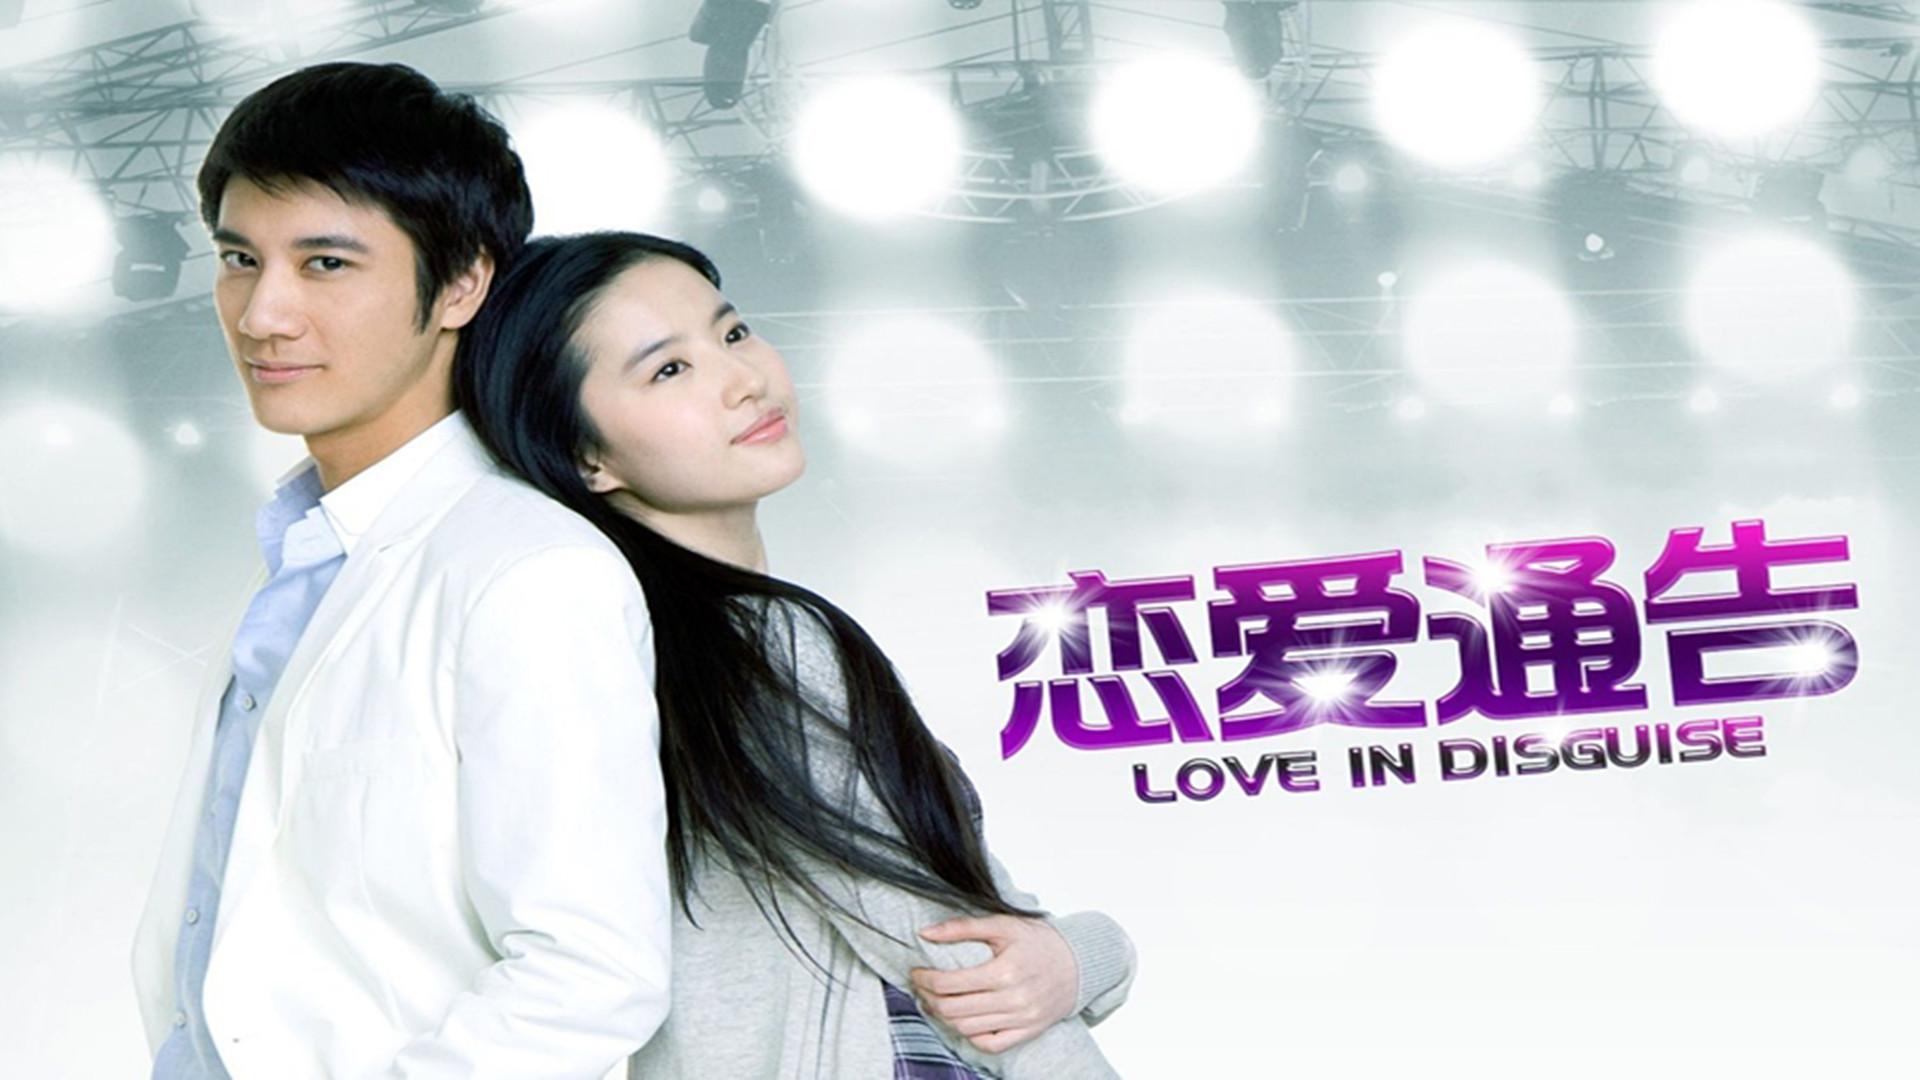 <b>刘亦菲的六部电影,最后一部饰演的呆萌狐妖又让人看到了她的演技</b>